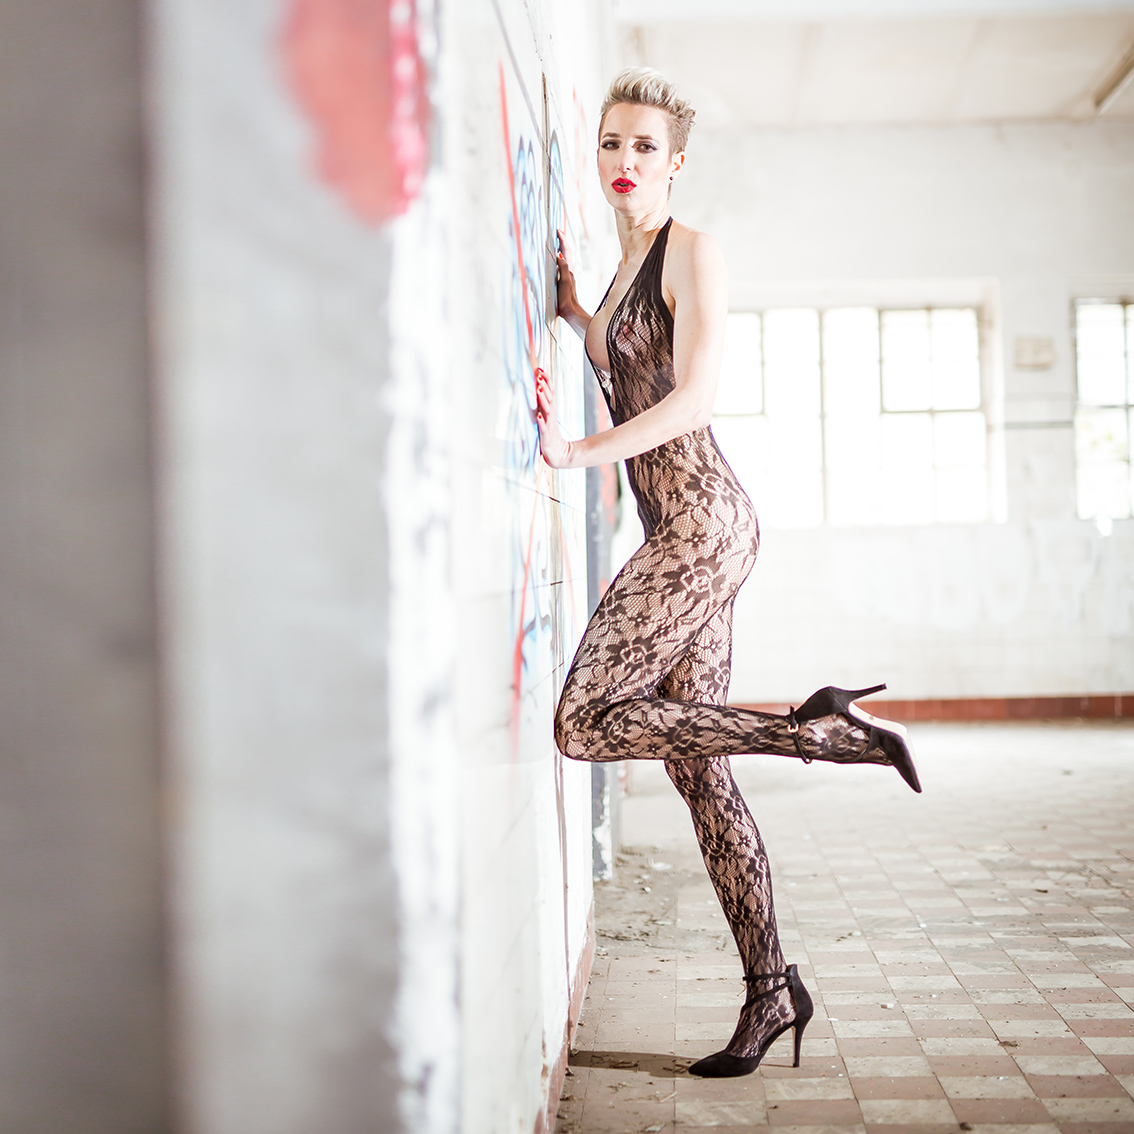 BEAUTY-und-BOUDOIR-aachen-erotikshooting-dueren-erotikfotos-alsdorf-erotikbilder-eschweiler-boudoirfotografie-aachen-Fotos-by-Domi-alsdorf-0470